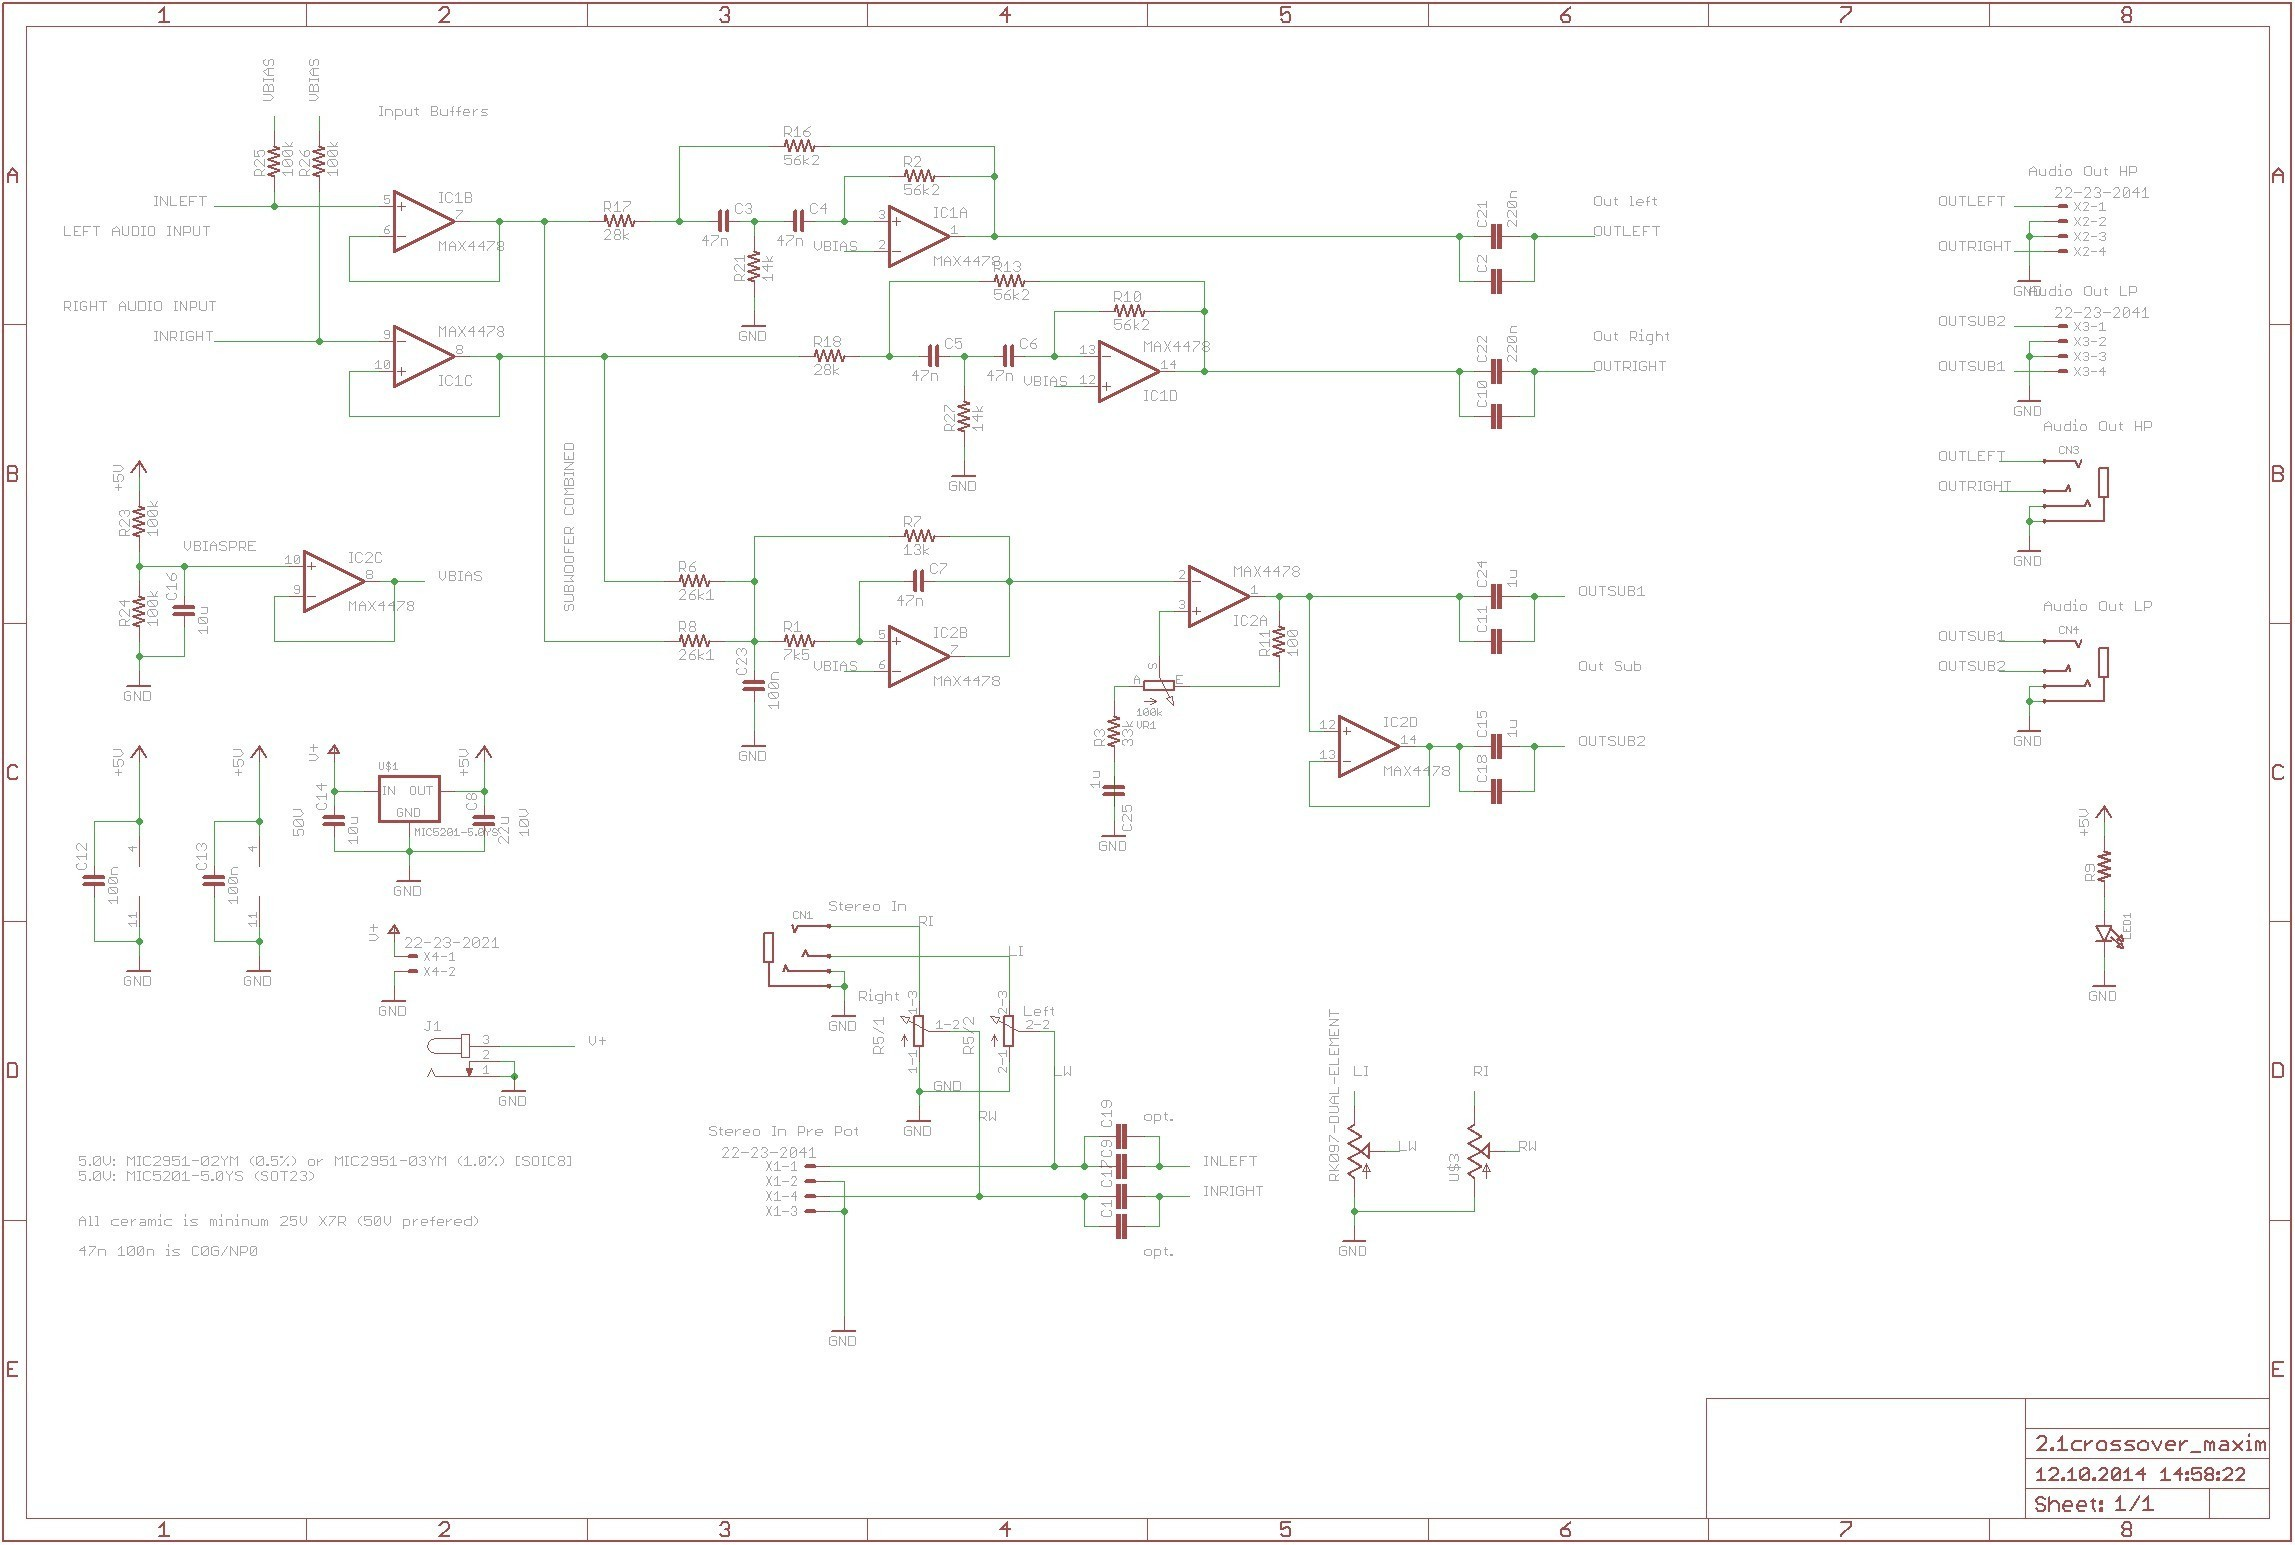 Engine Turbo Diagram 20fresh Bmw Engine Diagram Of Engine Turbo Diagram